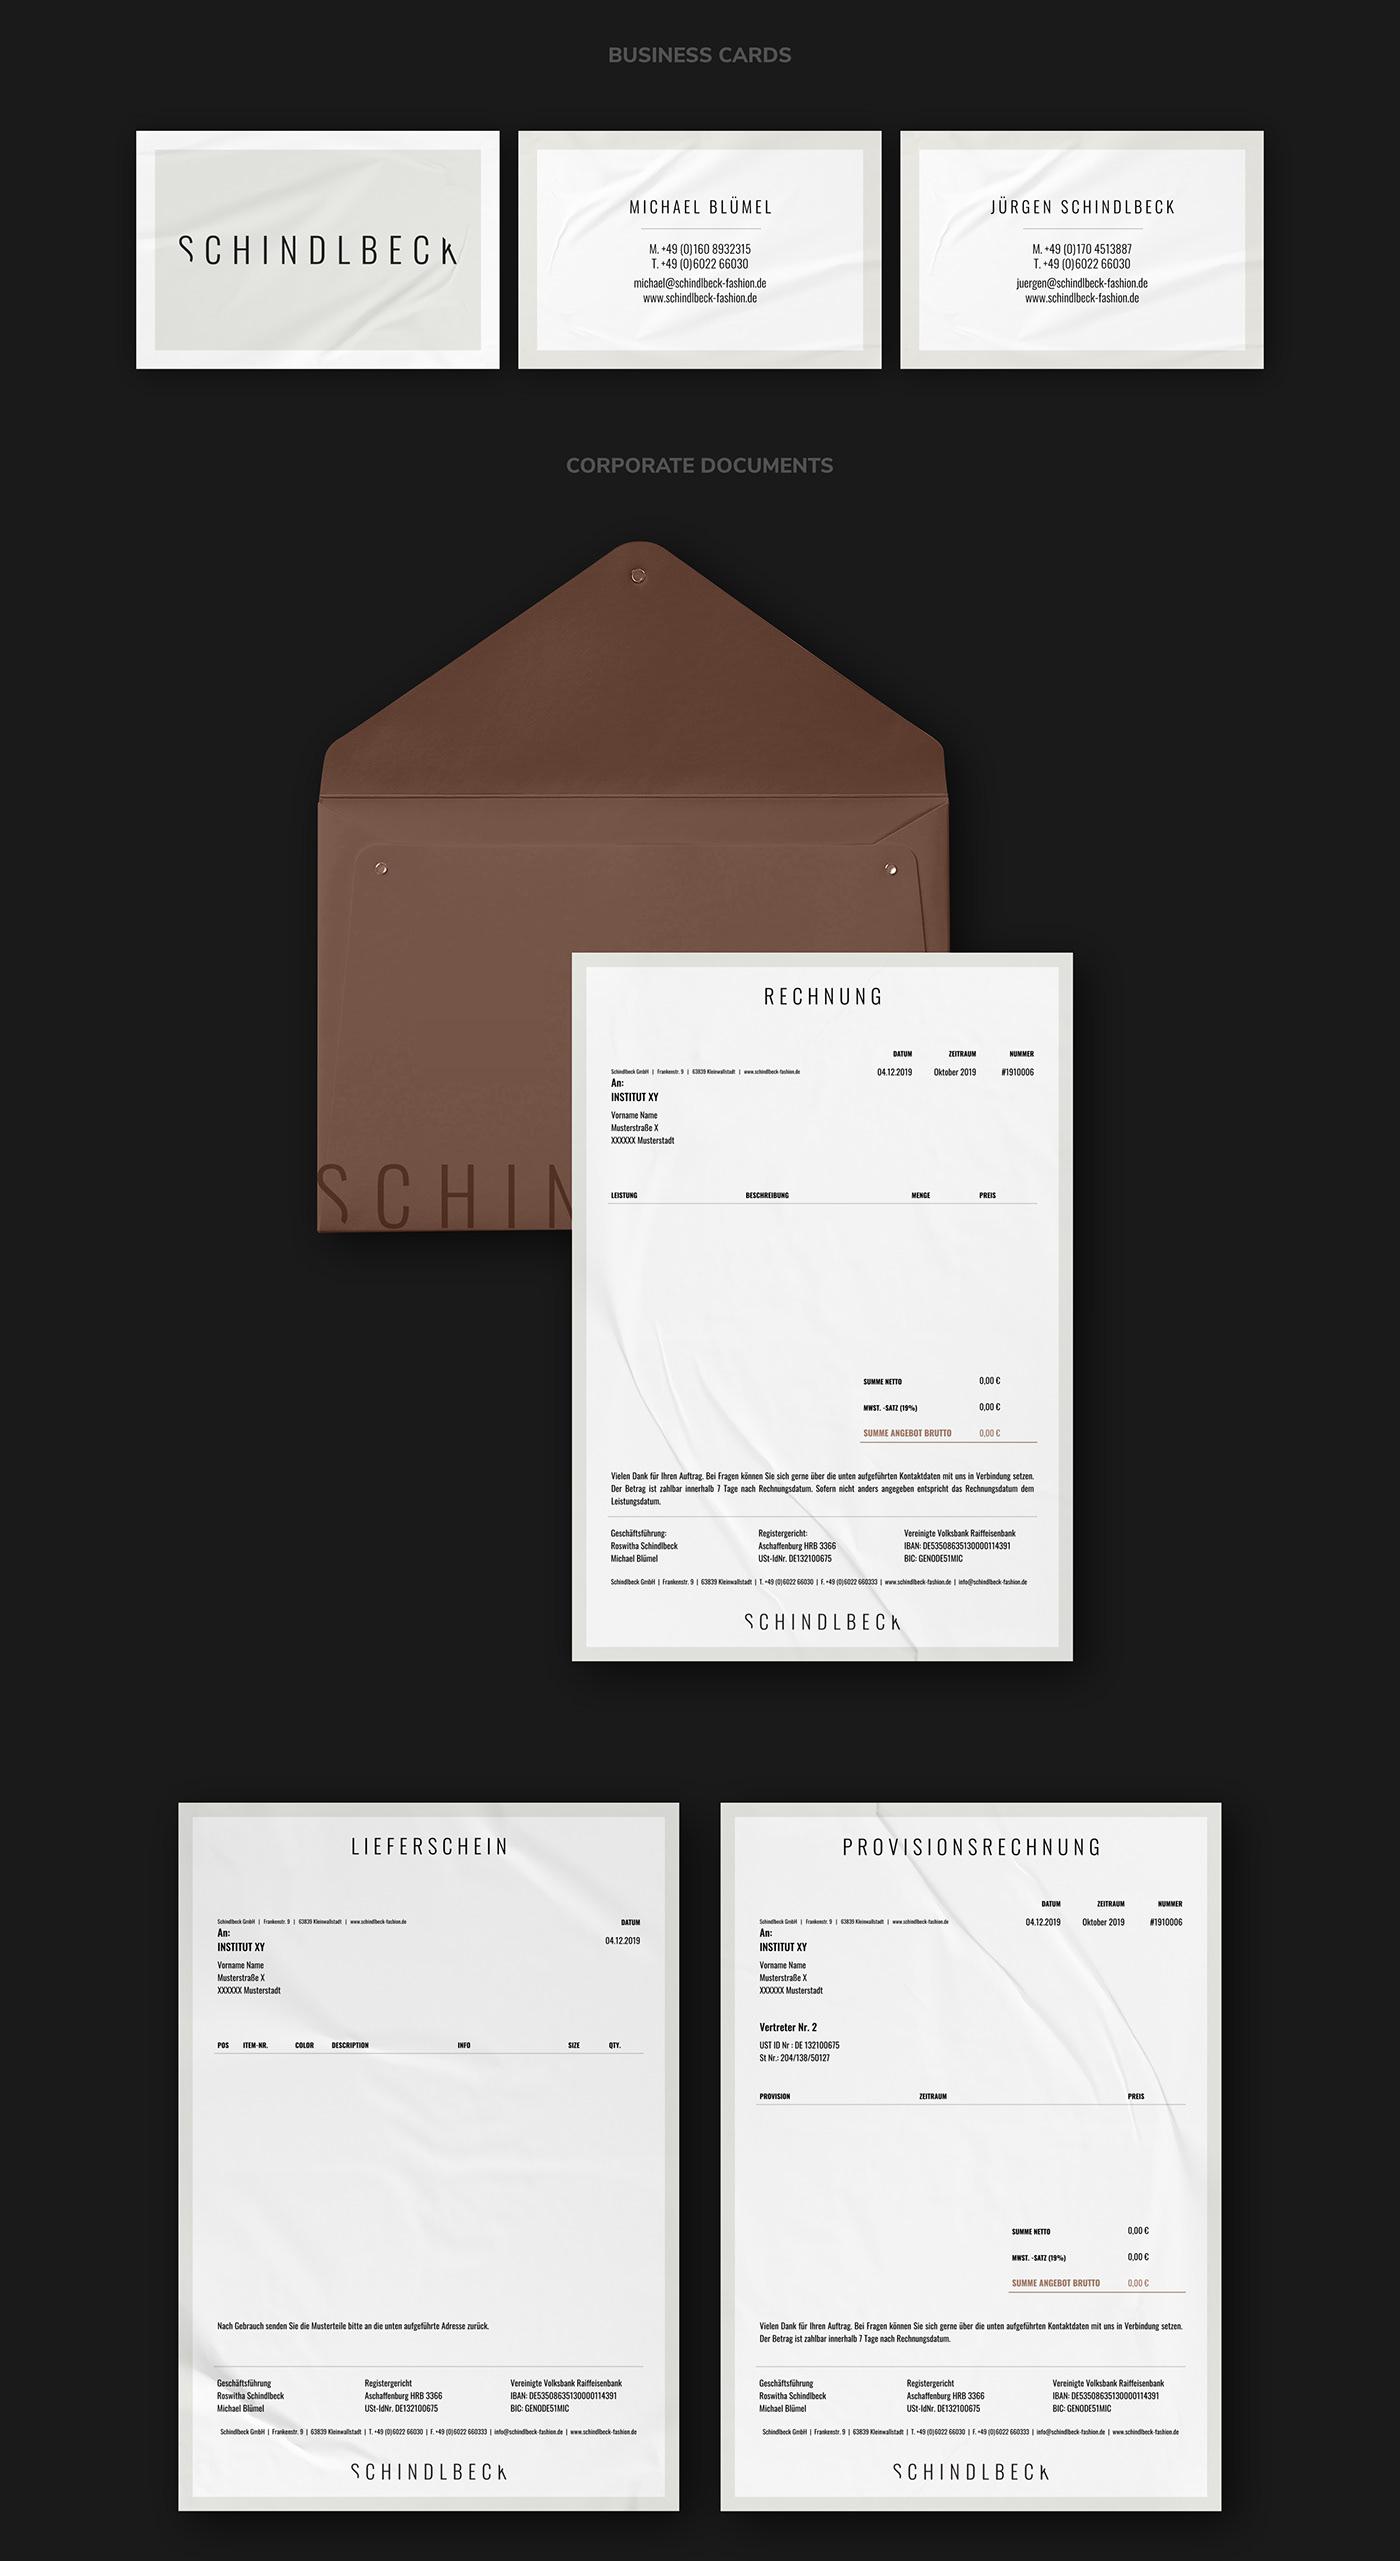 SCHINDLBECK FASHION // Print